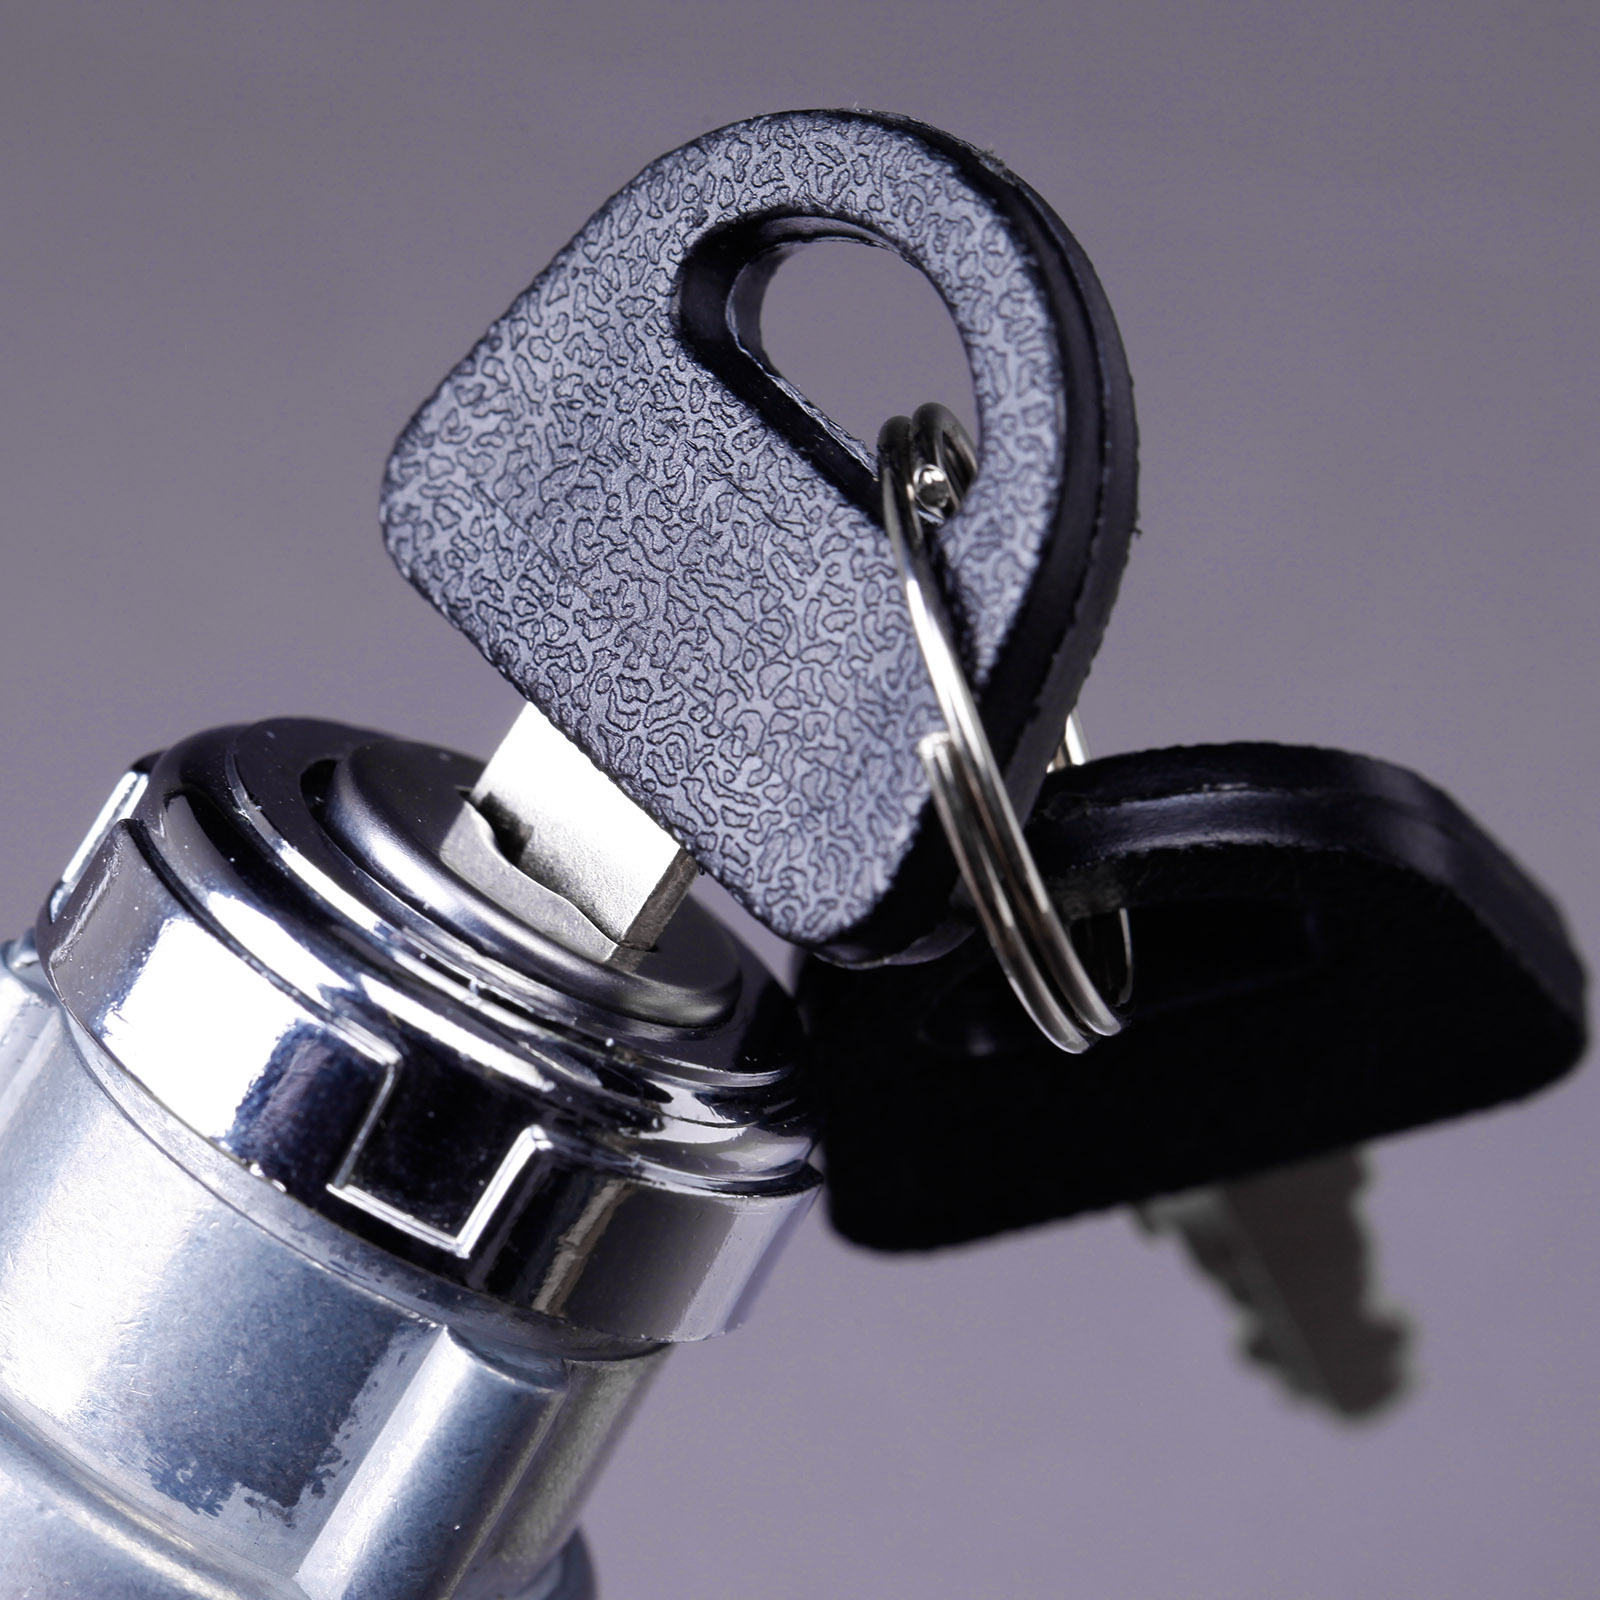 Universal Ignition Barrel Key Switch Waterproof Cover Keys